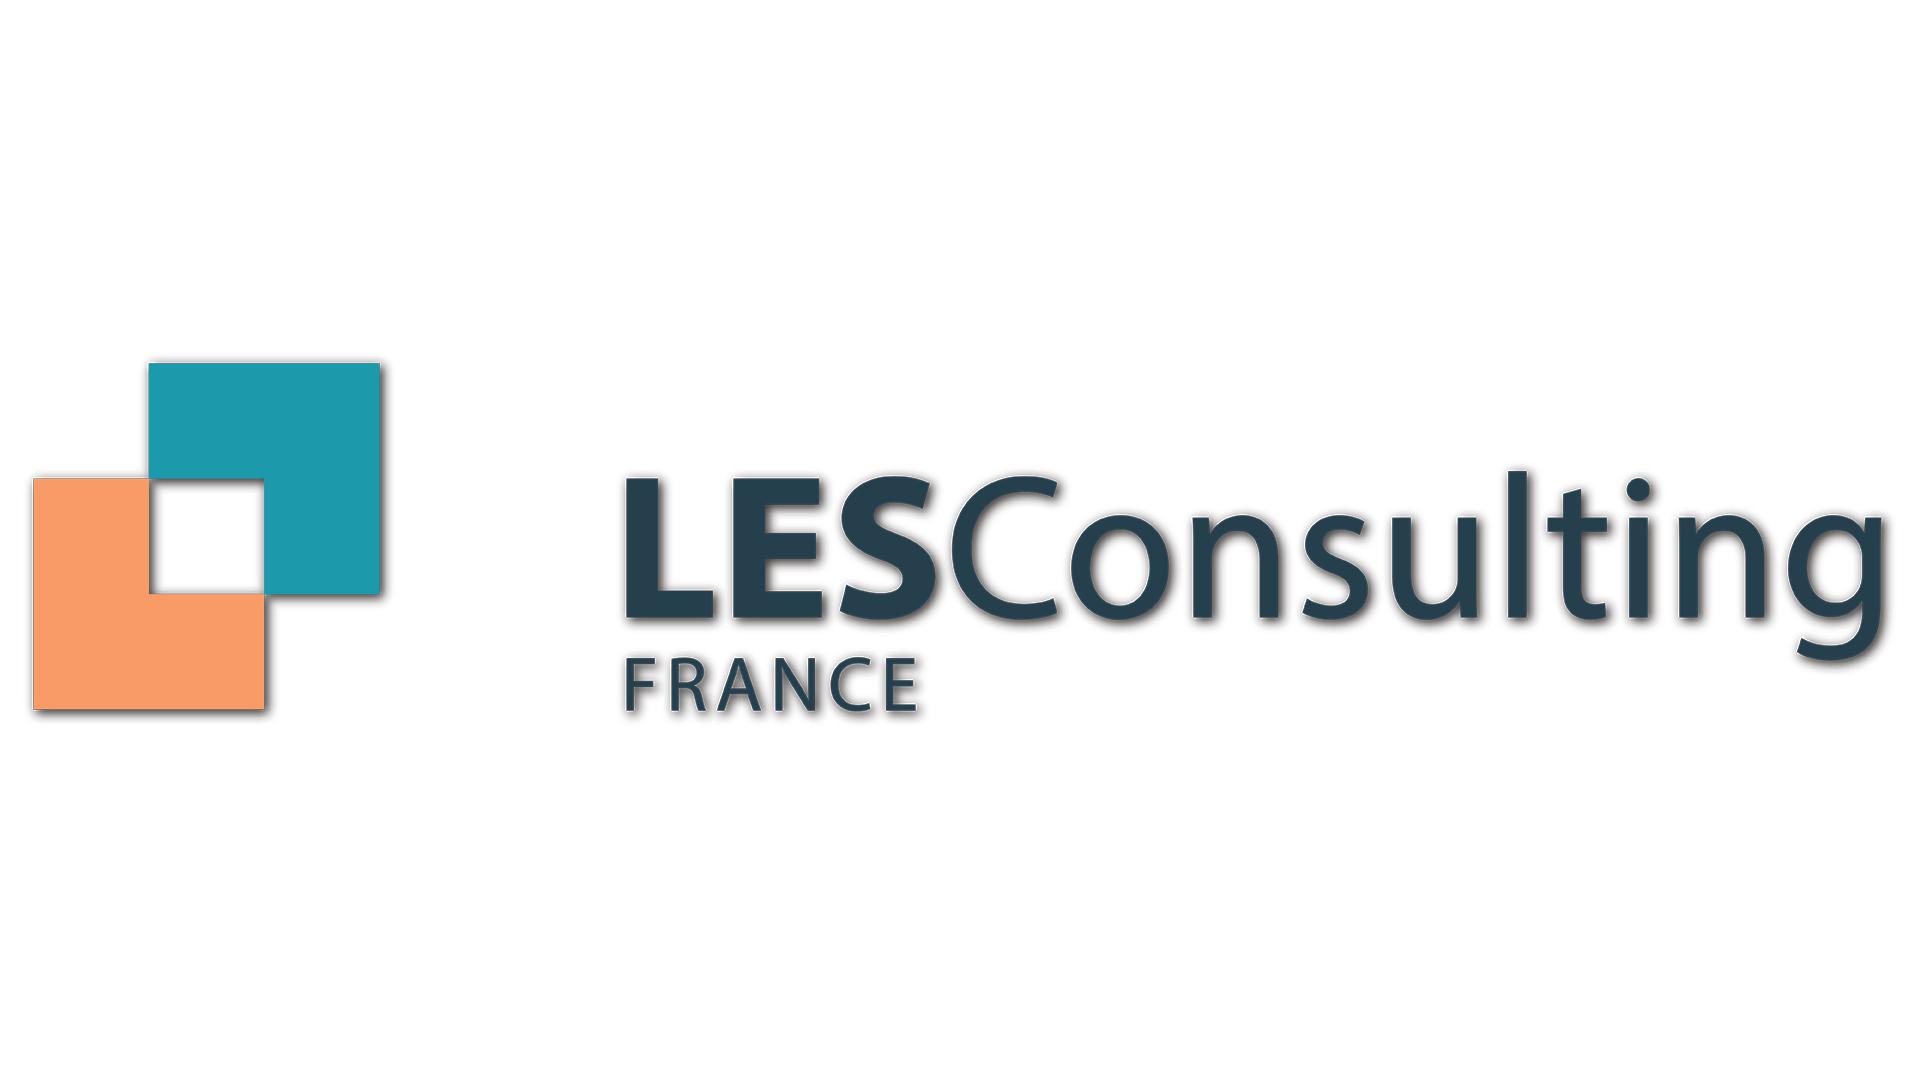 LesConsulting